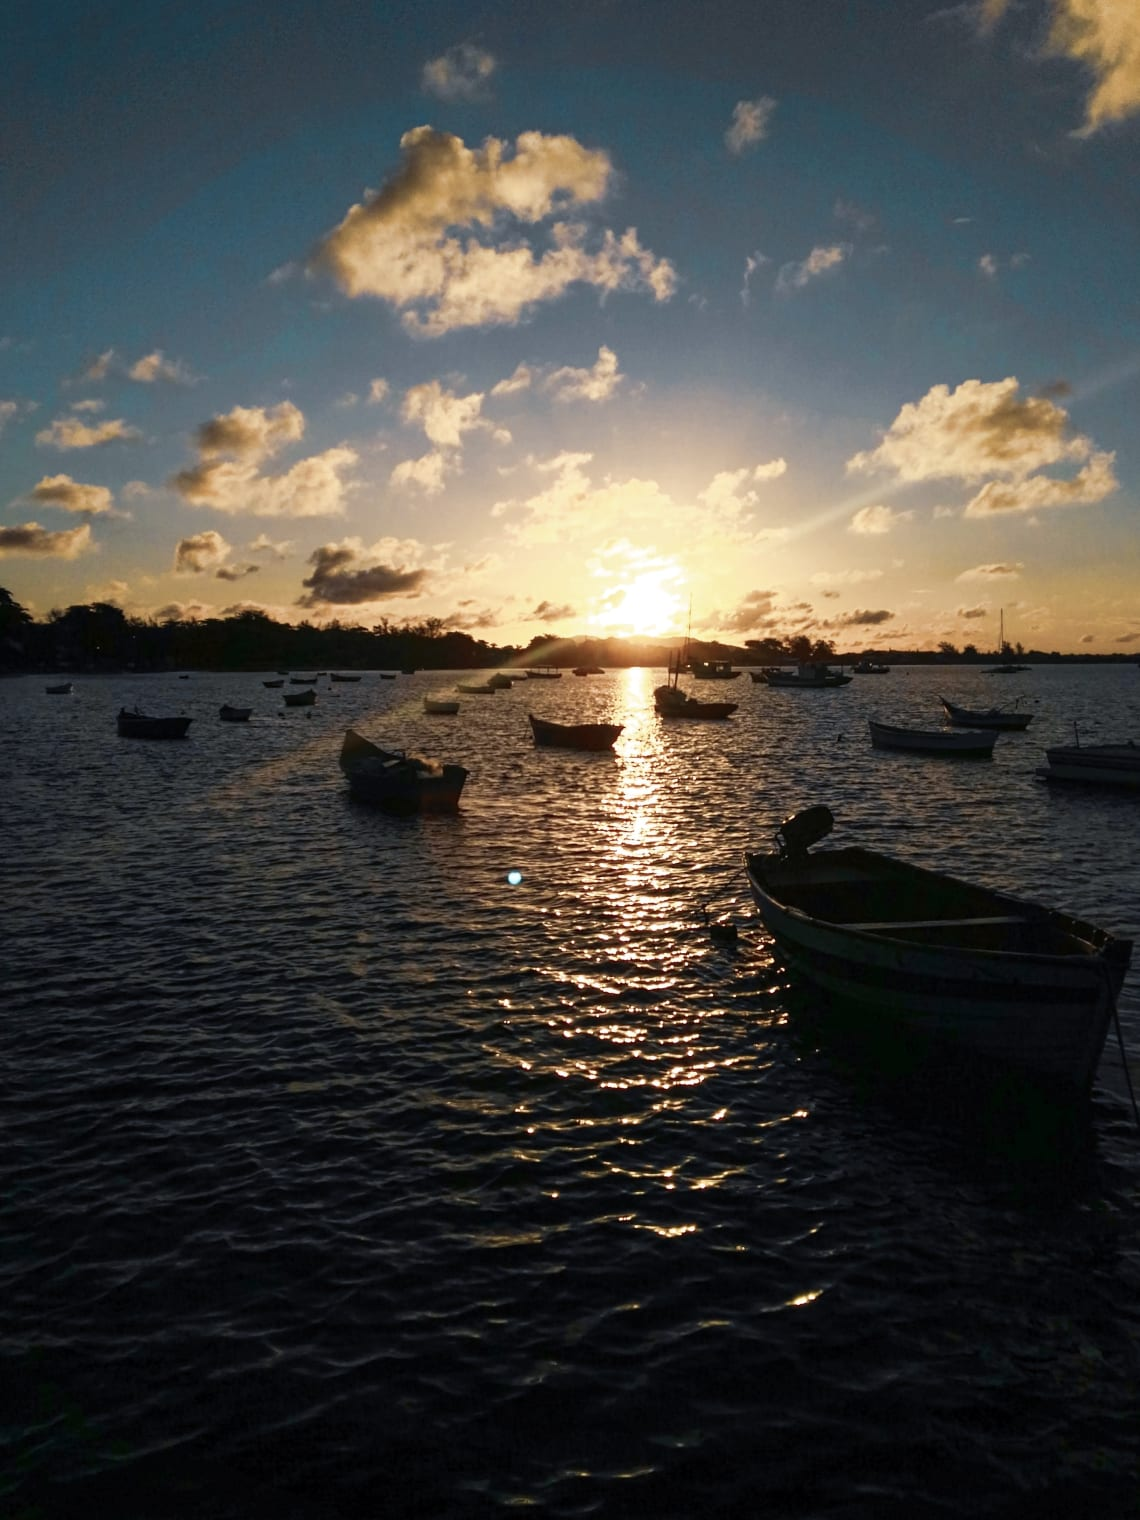 Cinco paraísos escondidos en Búzios que no te puedes perder - Brasil Praia de Manguinhos - Worldpackers